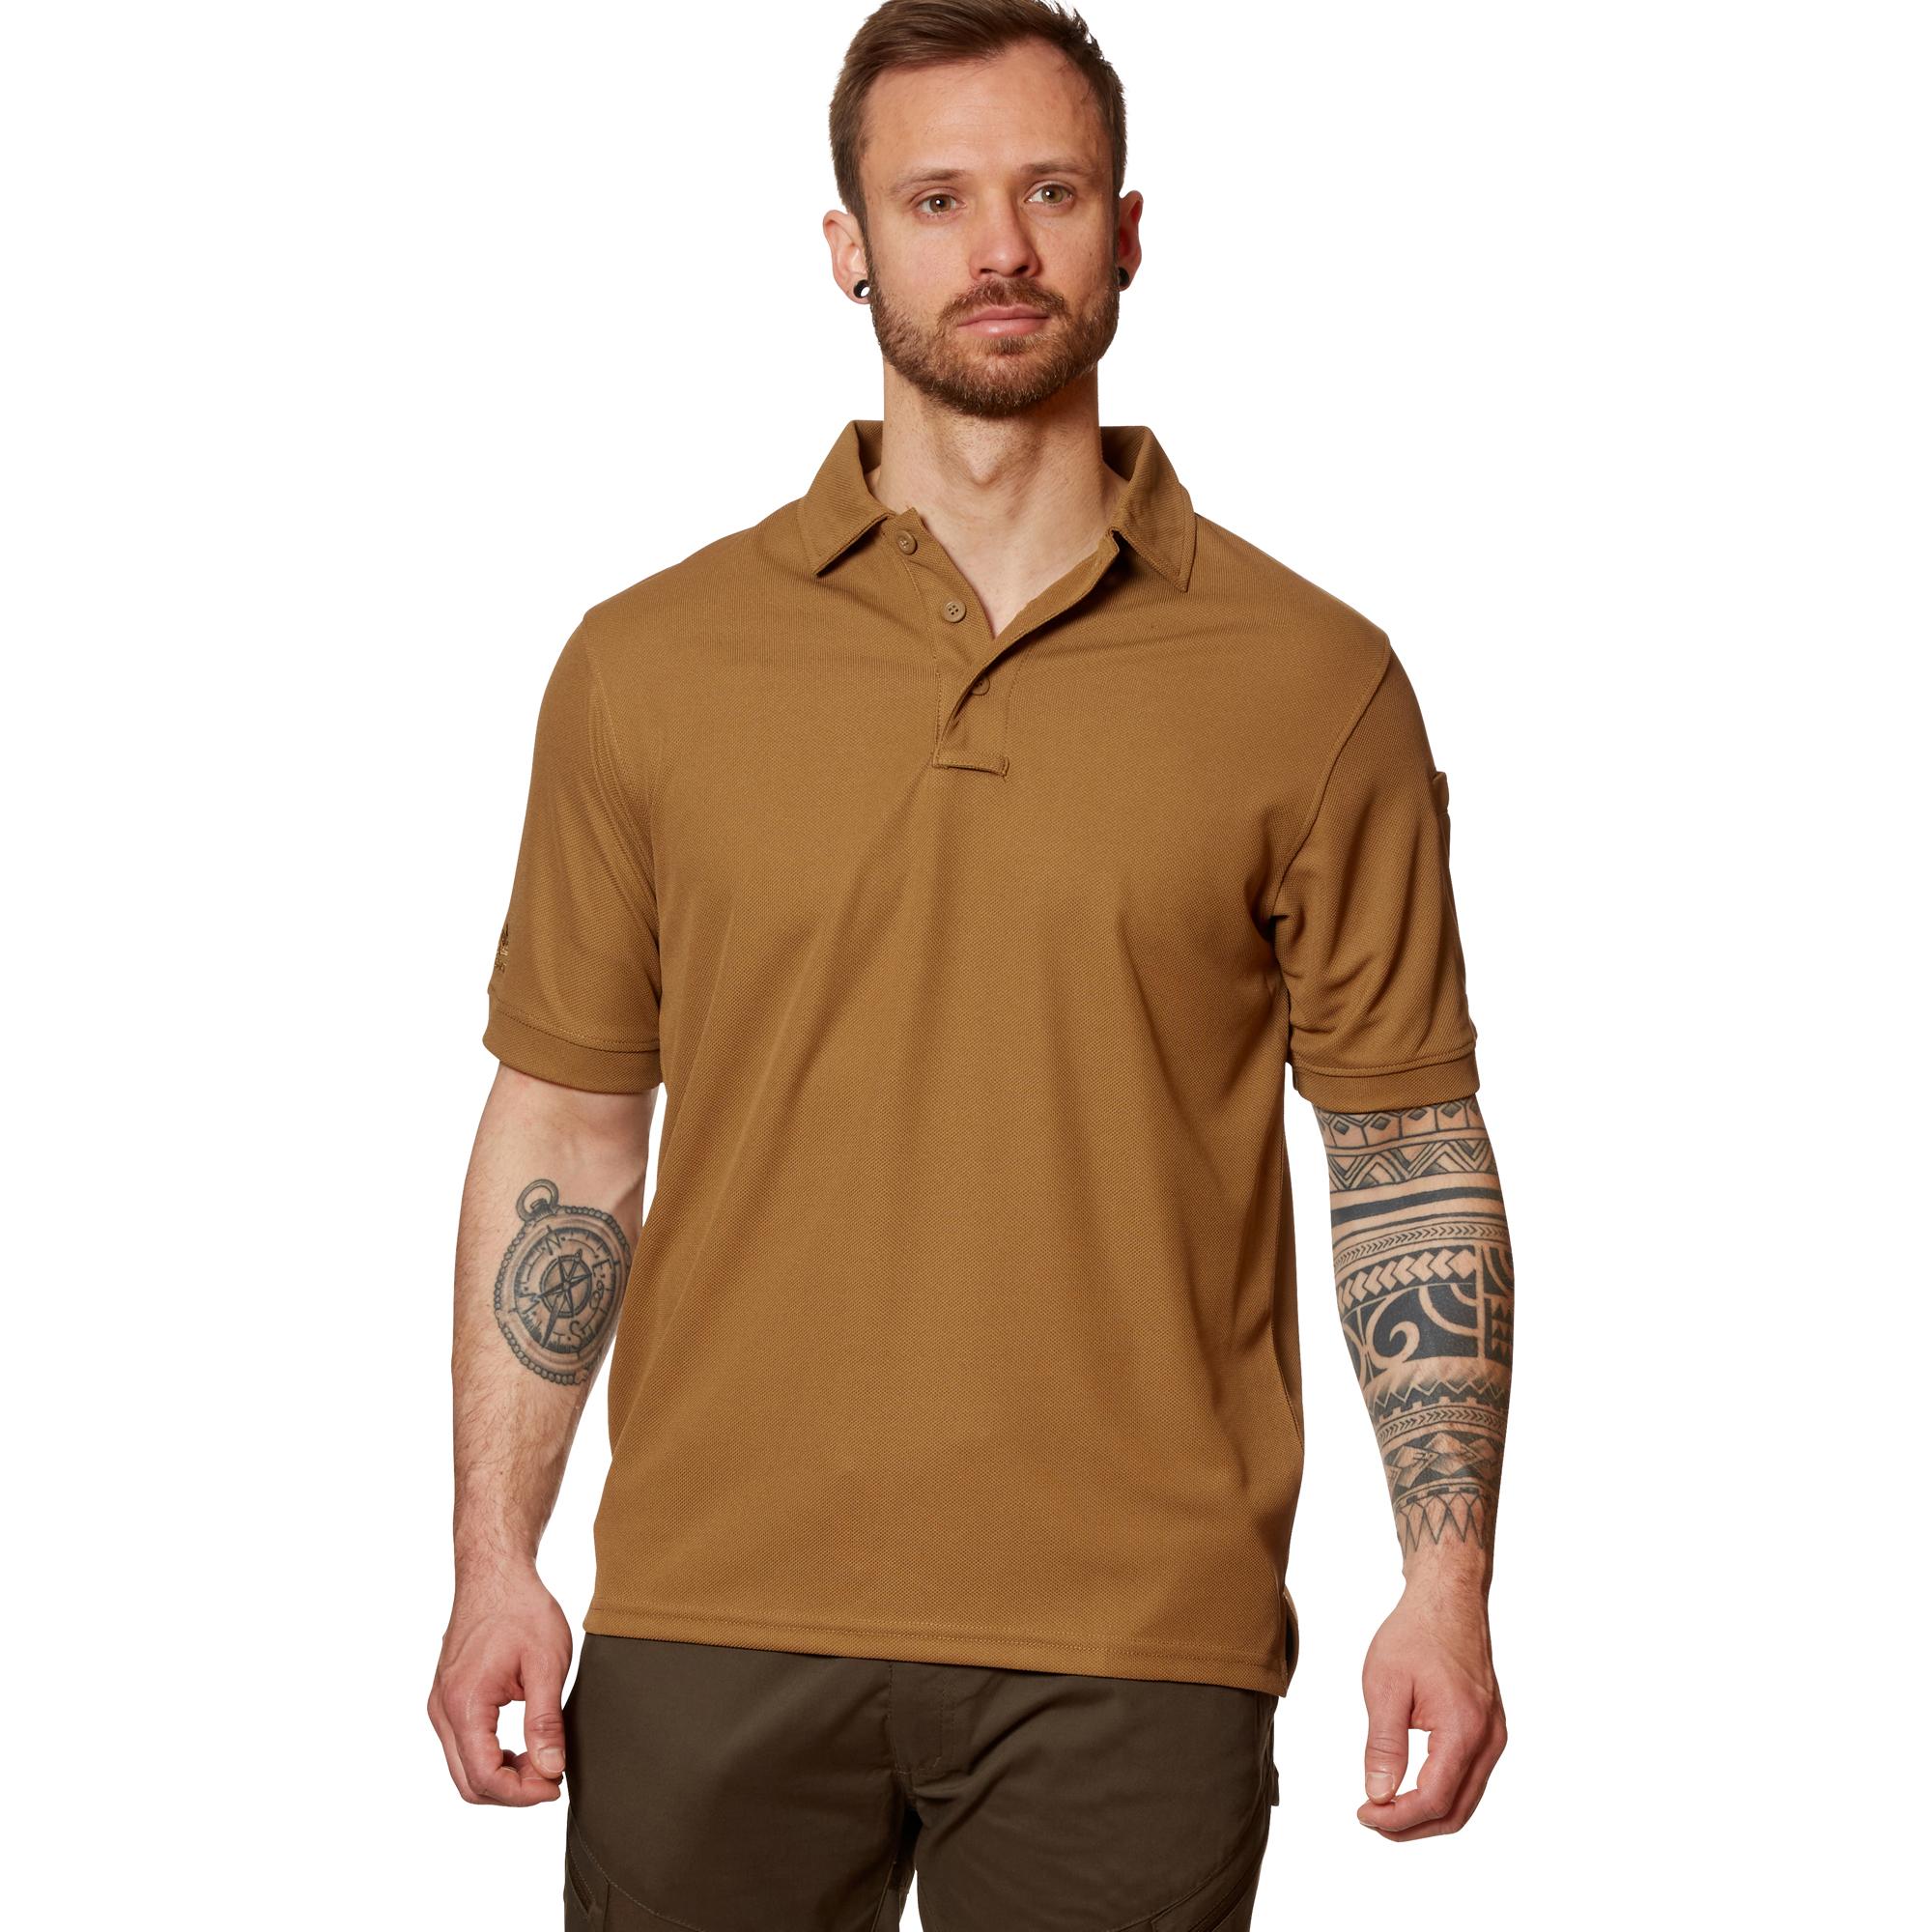 Camping La Manga For Sale: Camiseta Polo Helikon-Tex UTL TopCool Coyote